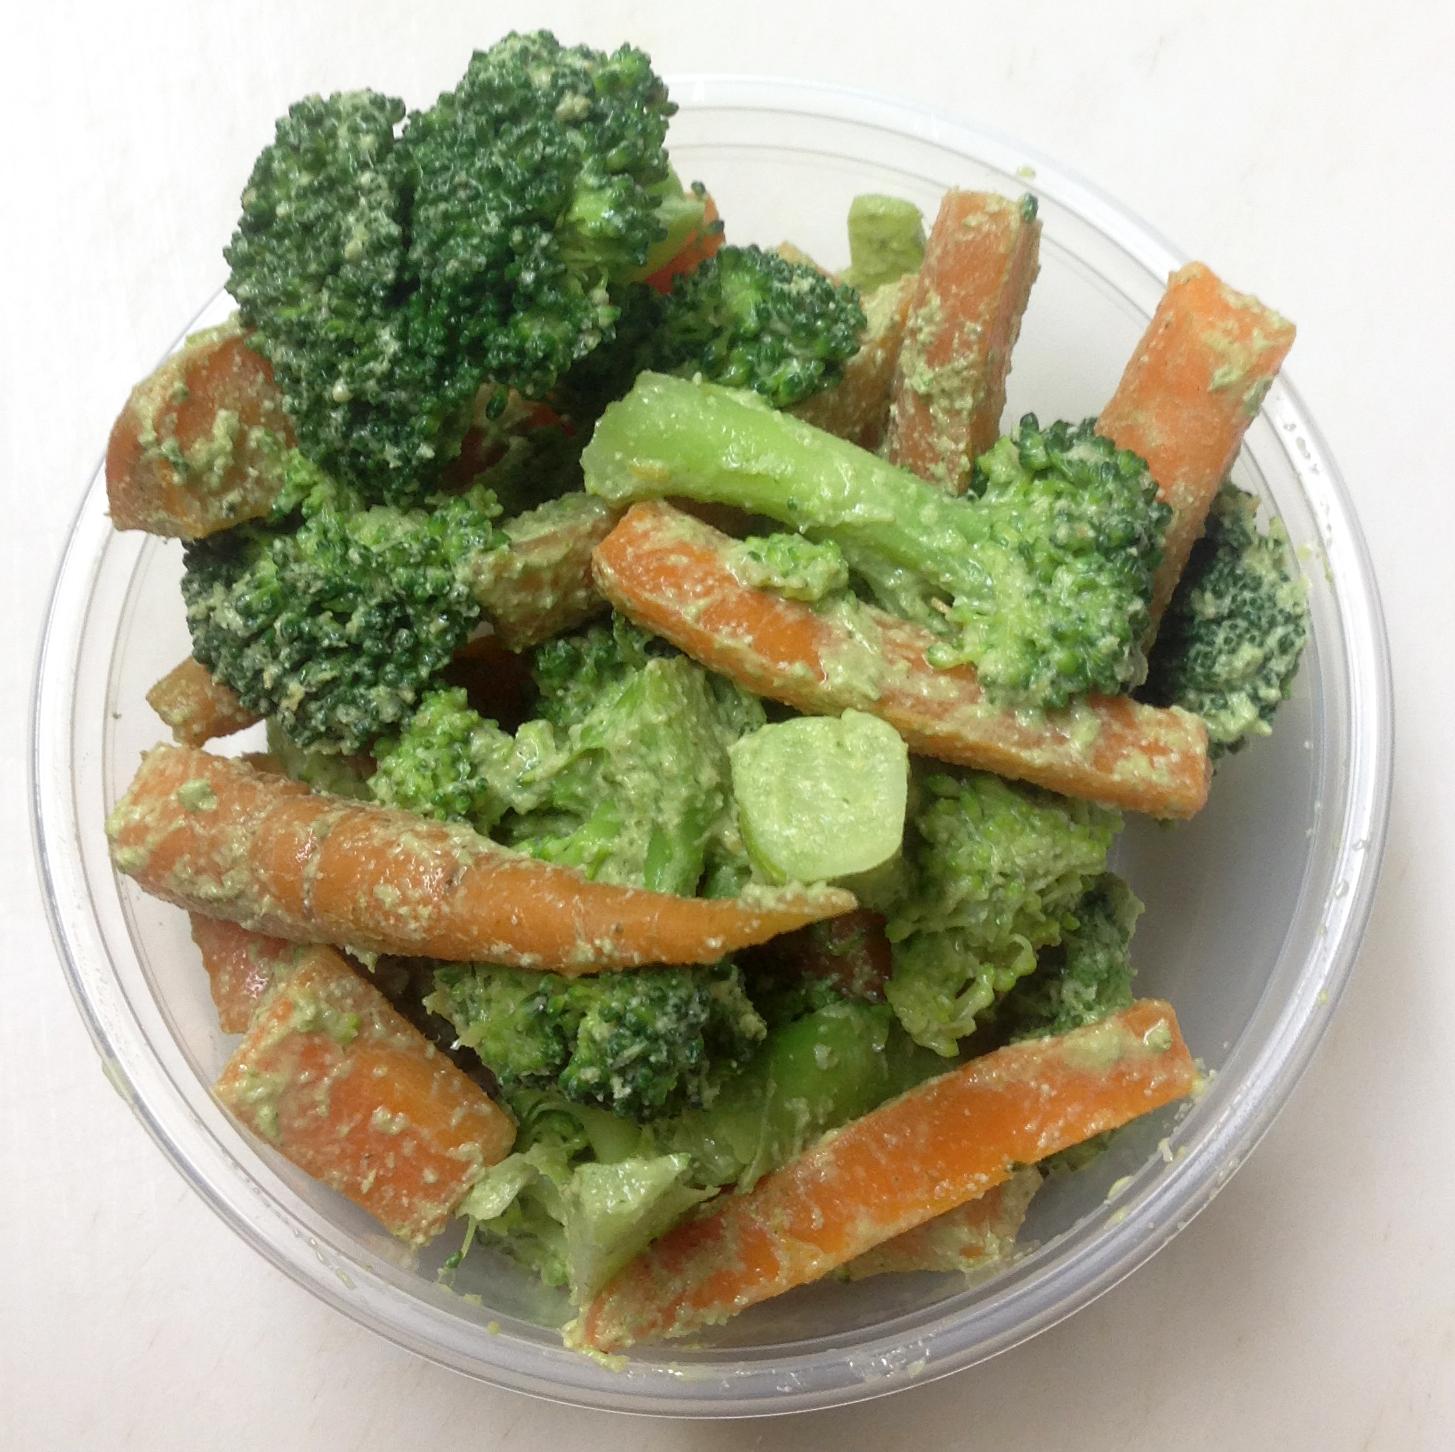 broccoli and carrot